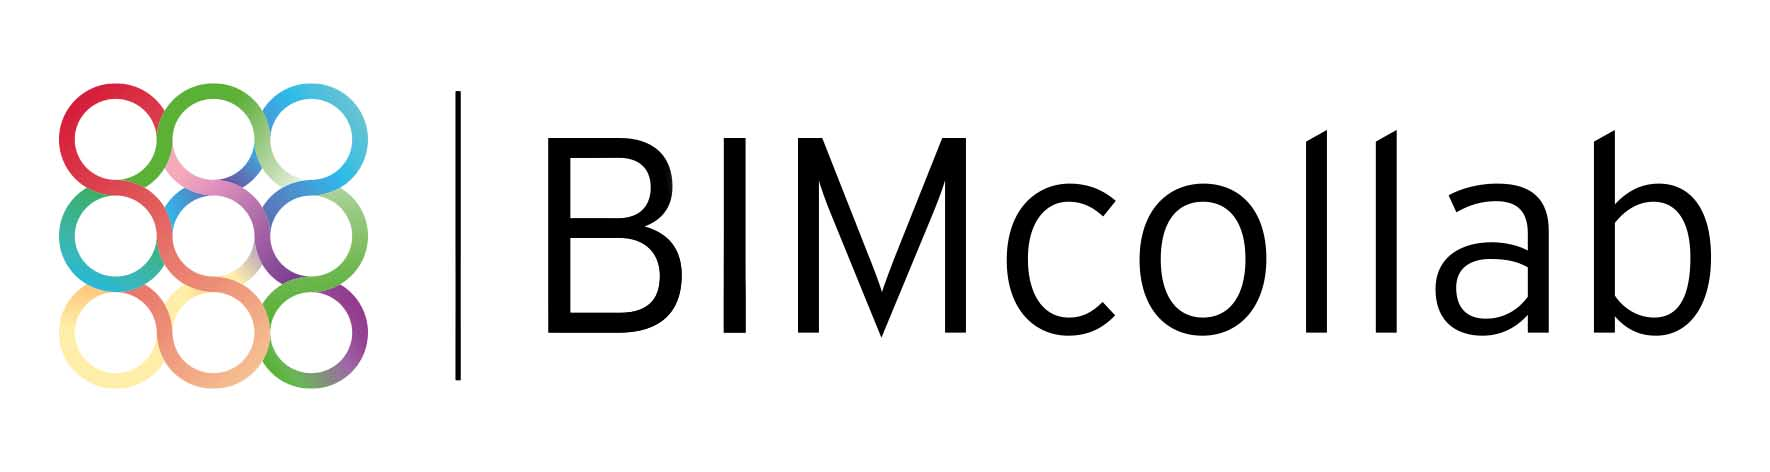 BIMcollab BIM sin dejar fuera CAD